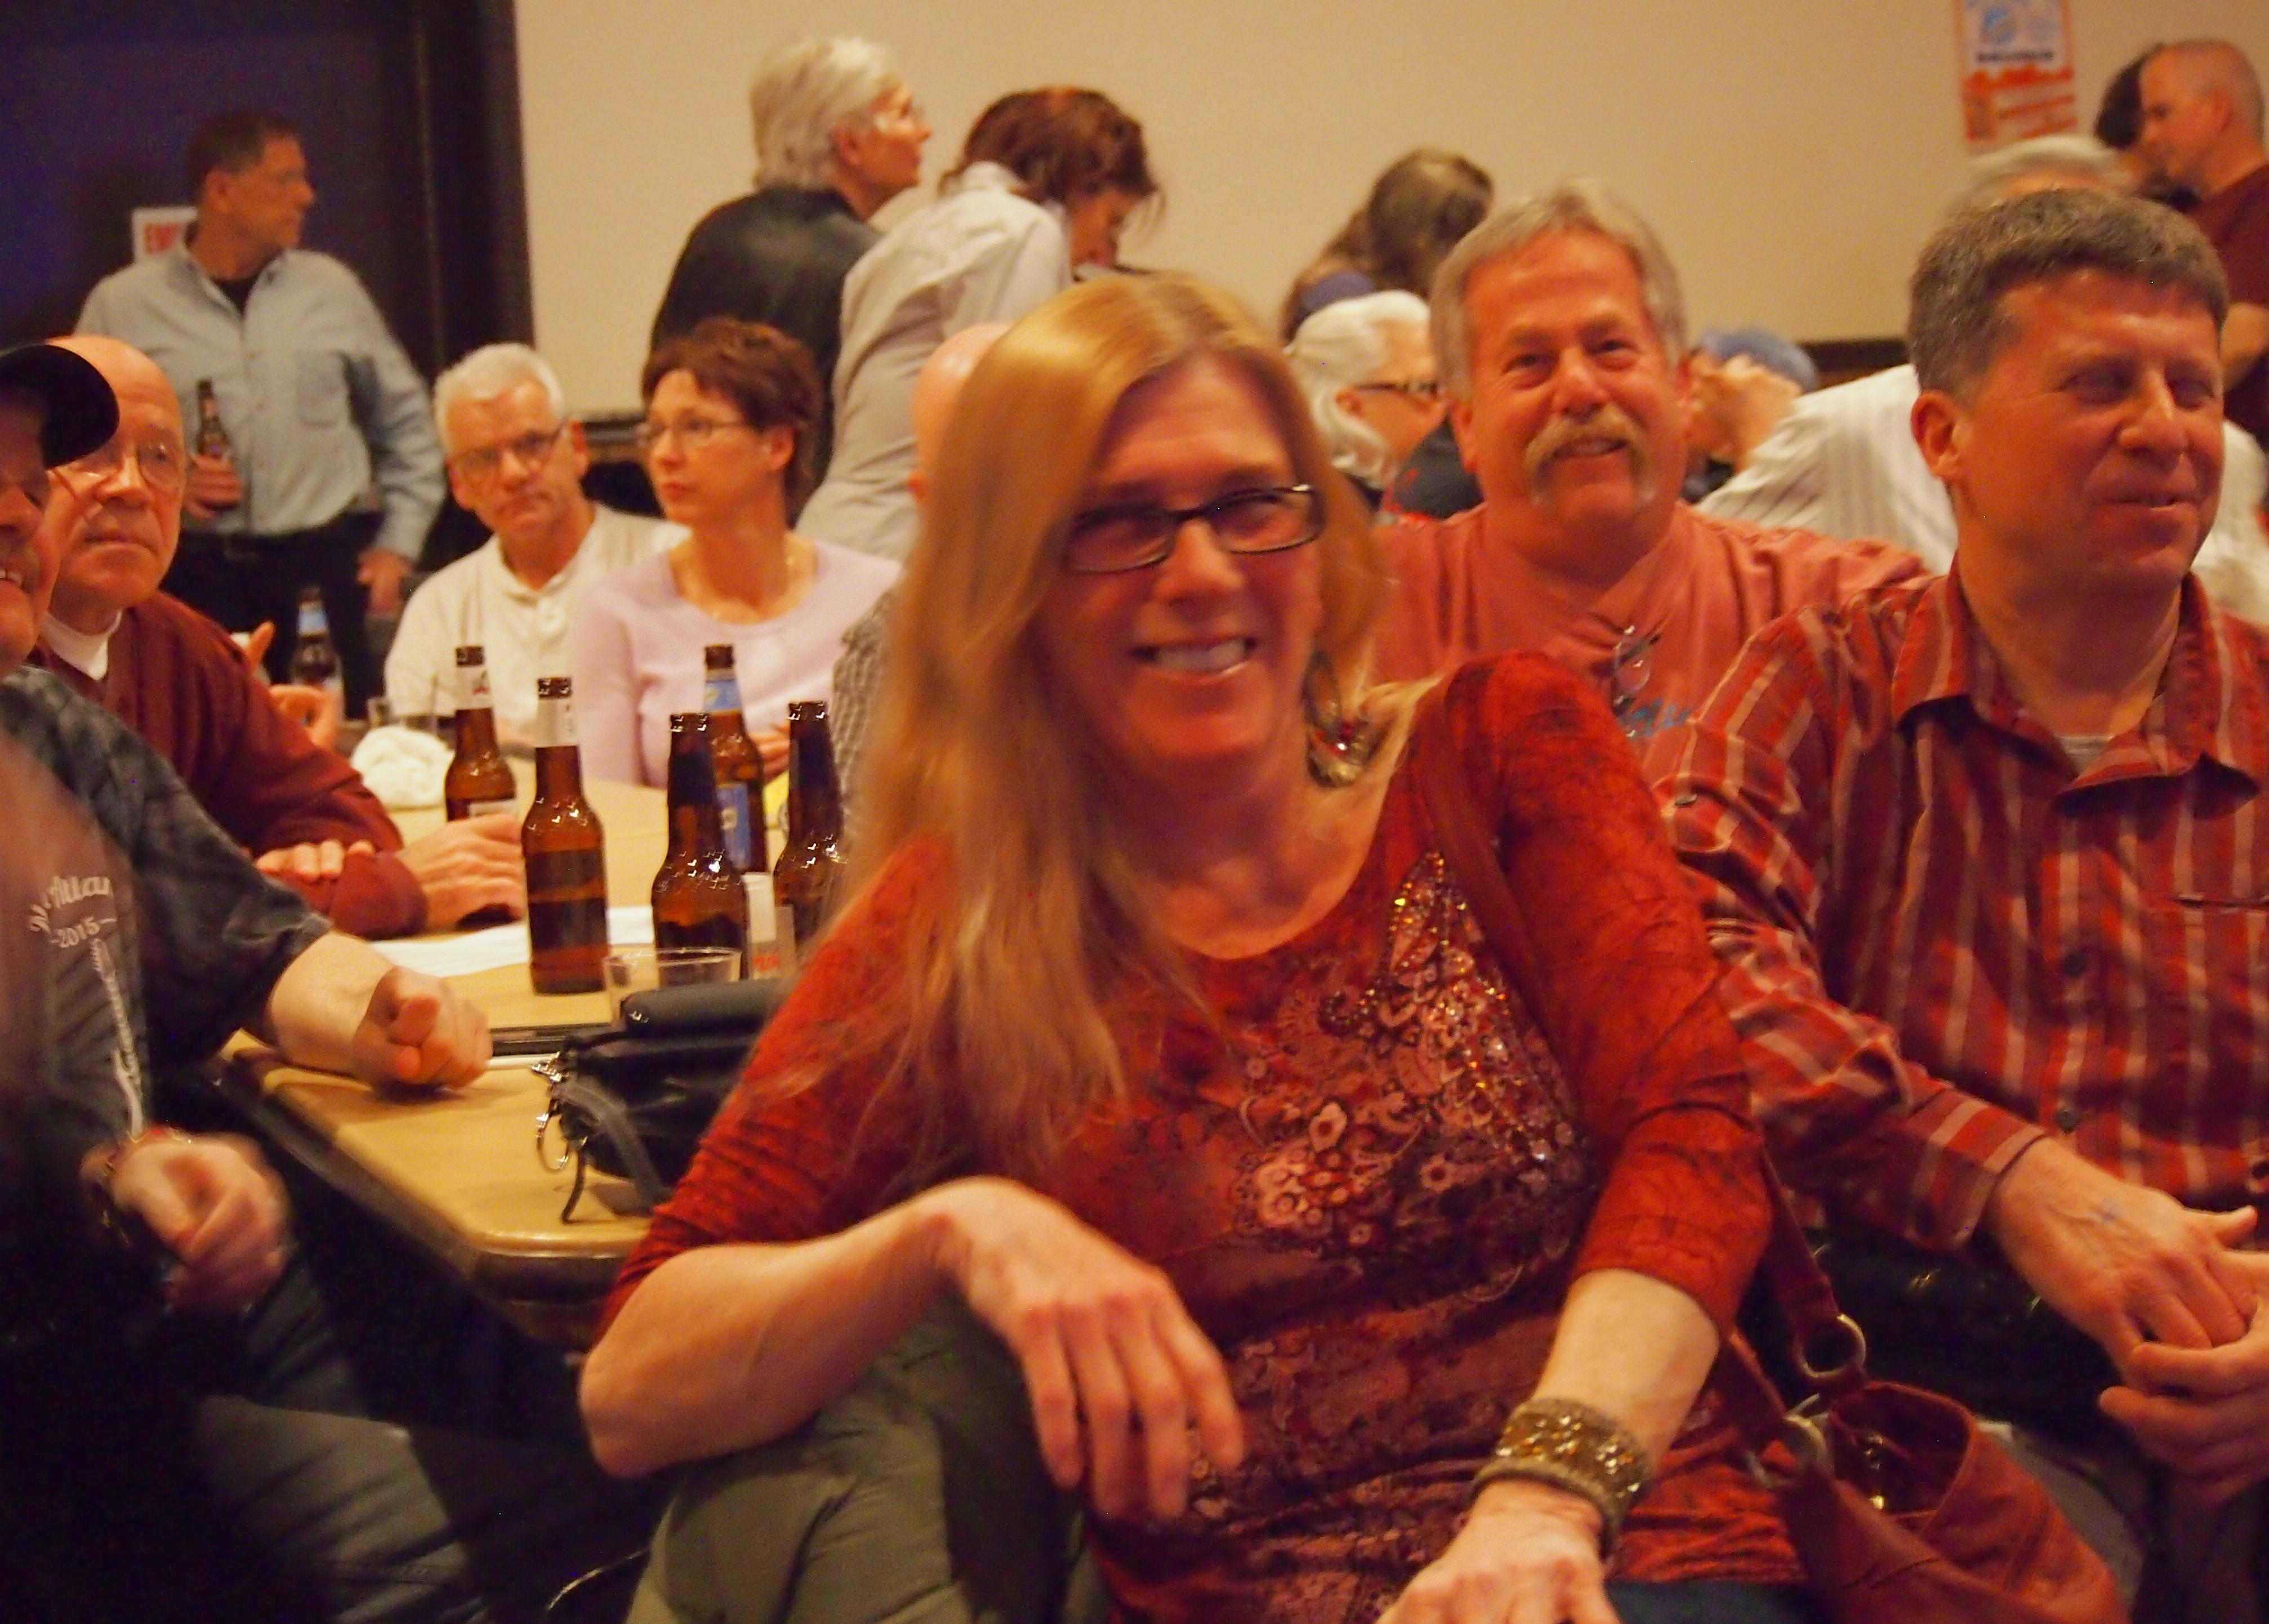 Crowd3-5-201515